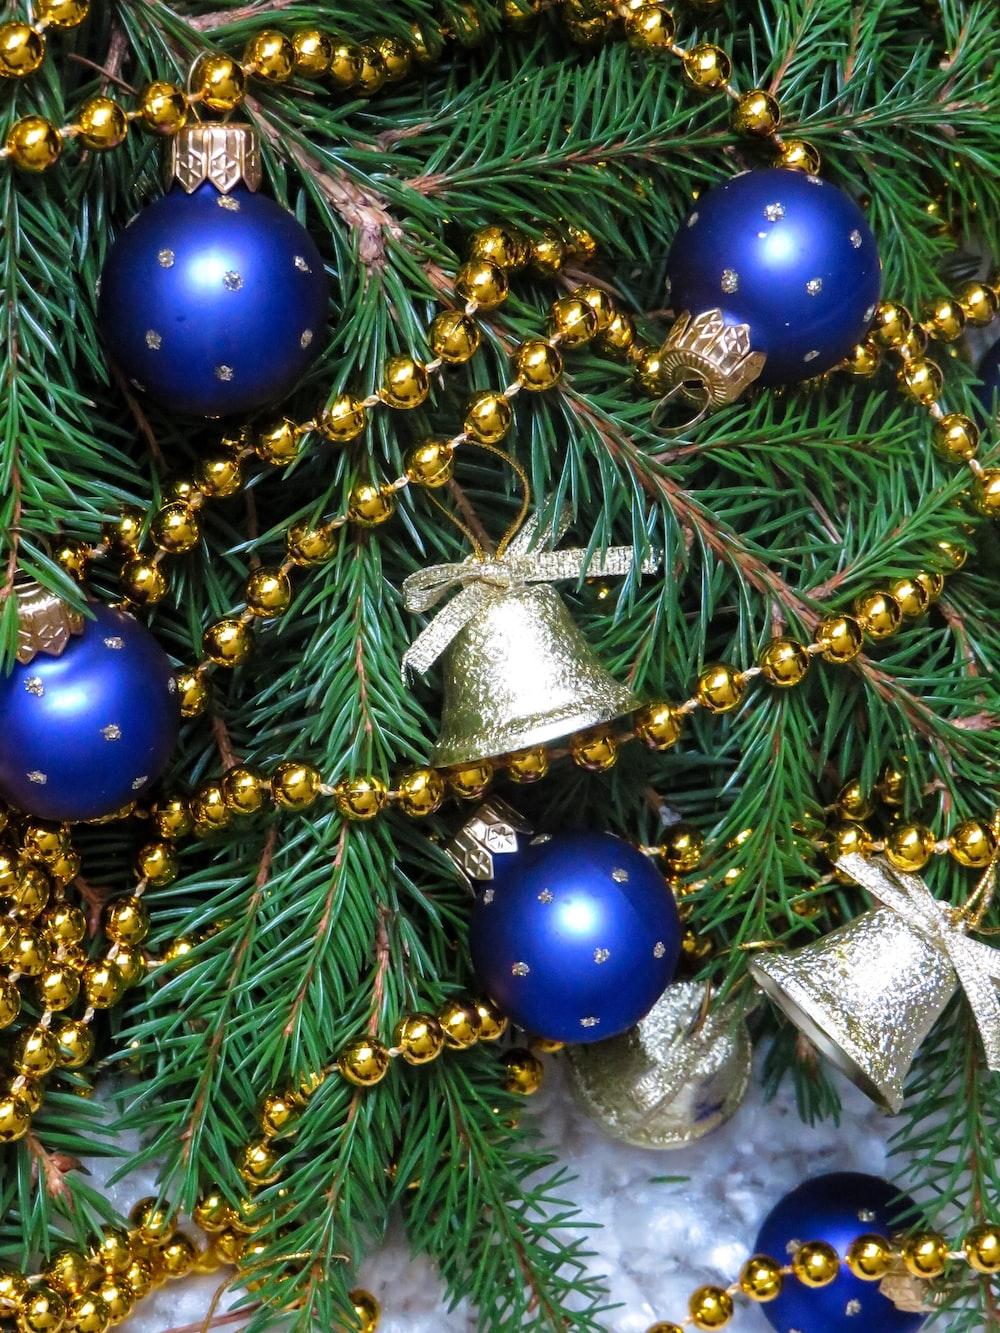 blue Christmas bauble balls